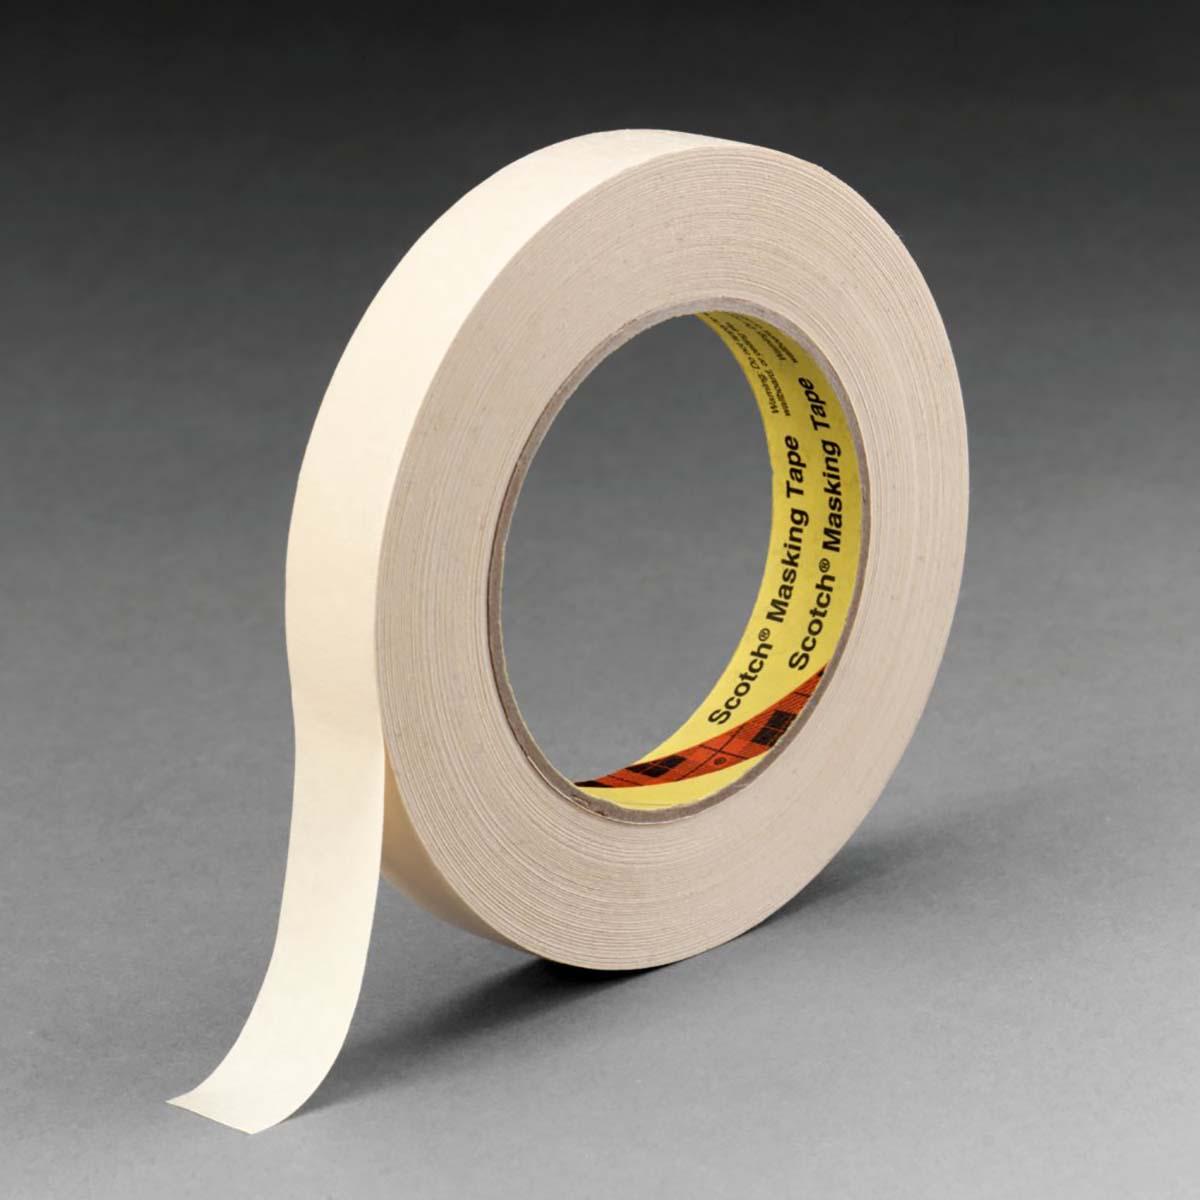 3M High Performance Masking Tape 232 Tan, 48 mm x 55 m 6.3 mil, 24 per case Bulk